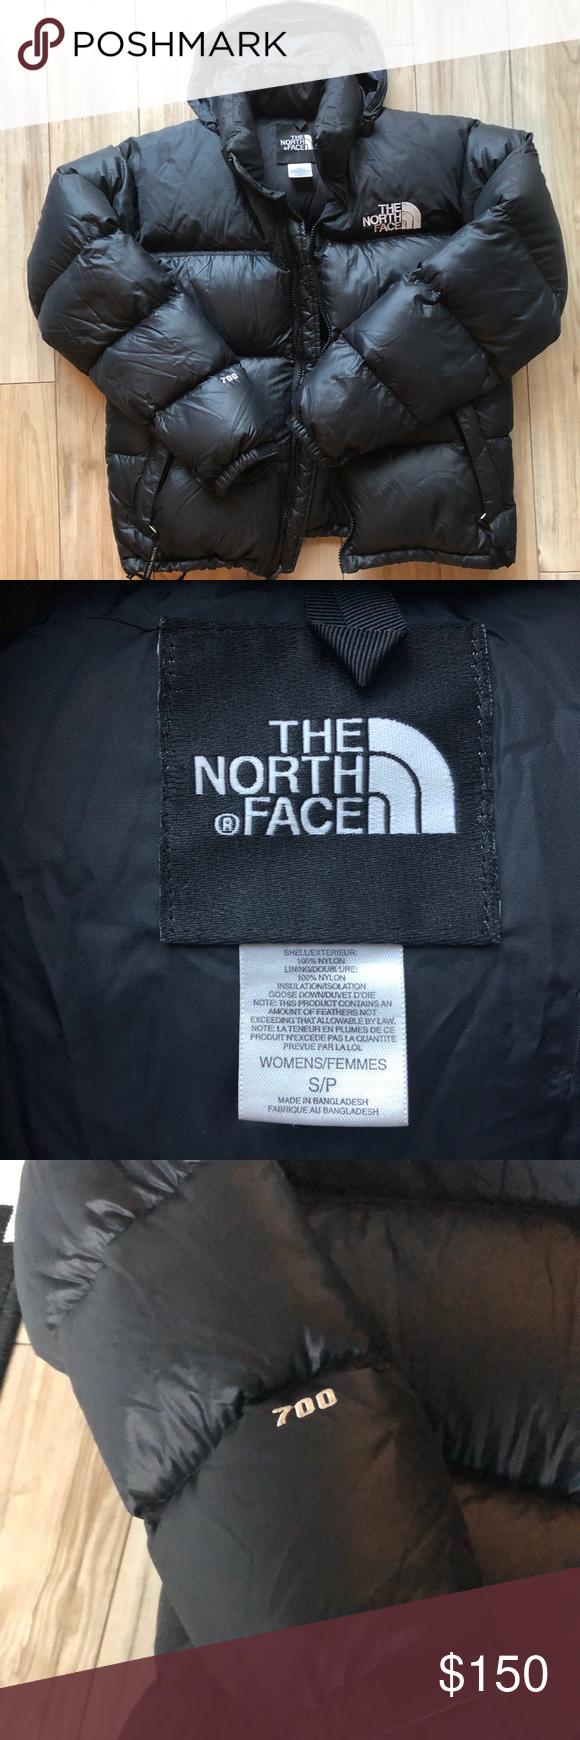 North Face Nuptse 700 Women S Black Puffer Jacket Black Puffer Jacket North Face Nuptse Puffer Jackets [ 1740 x 580 Pixel ]